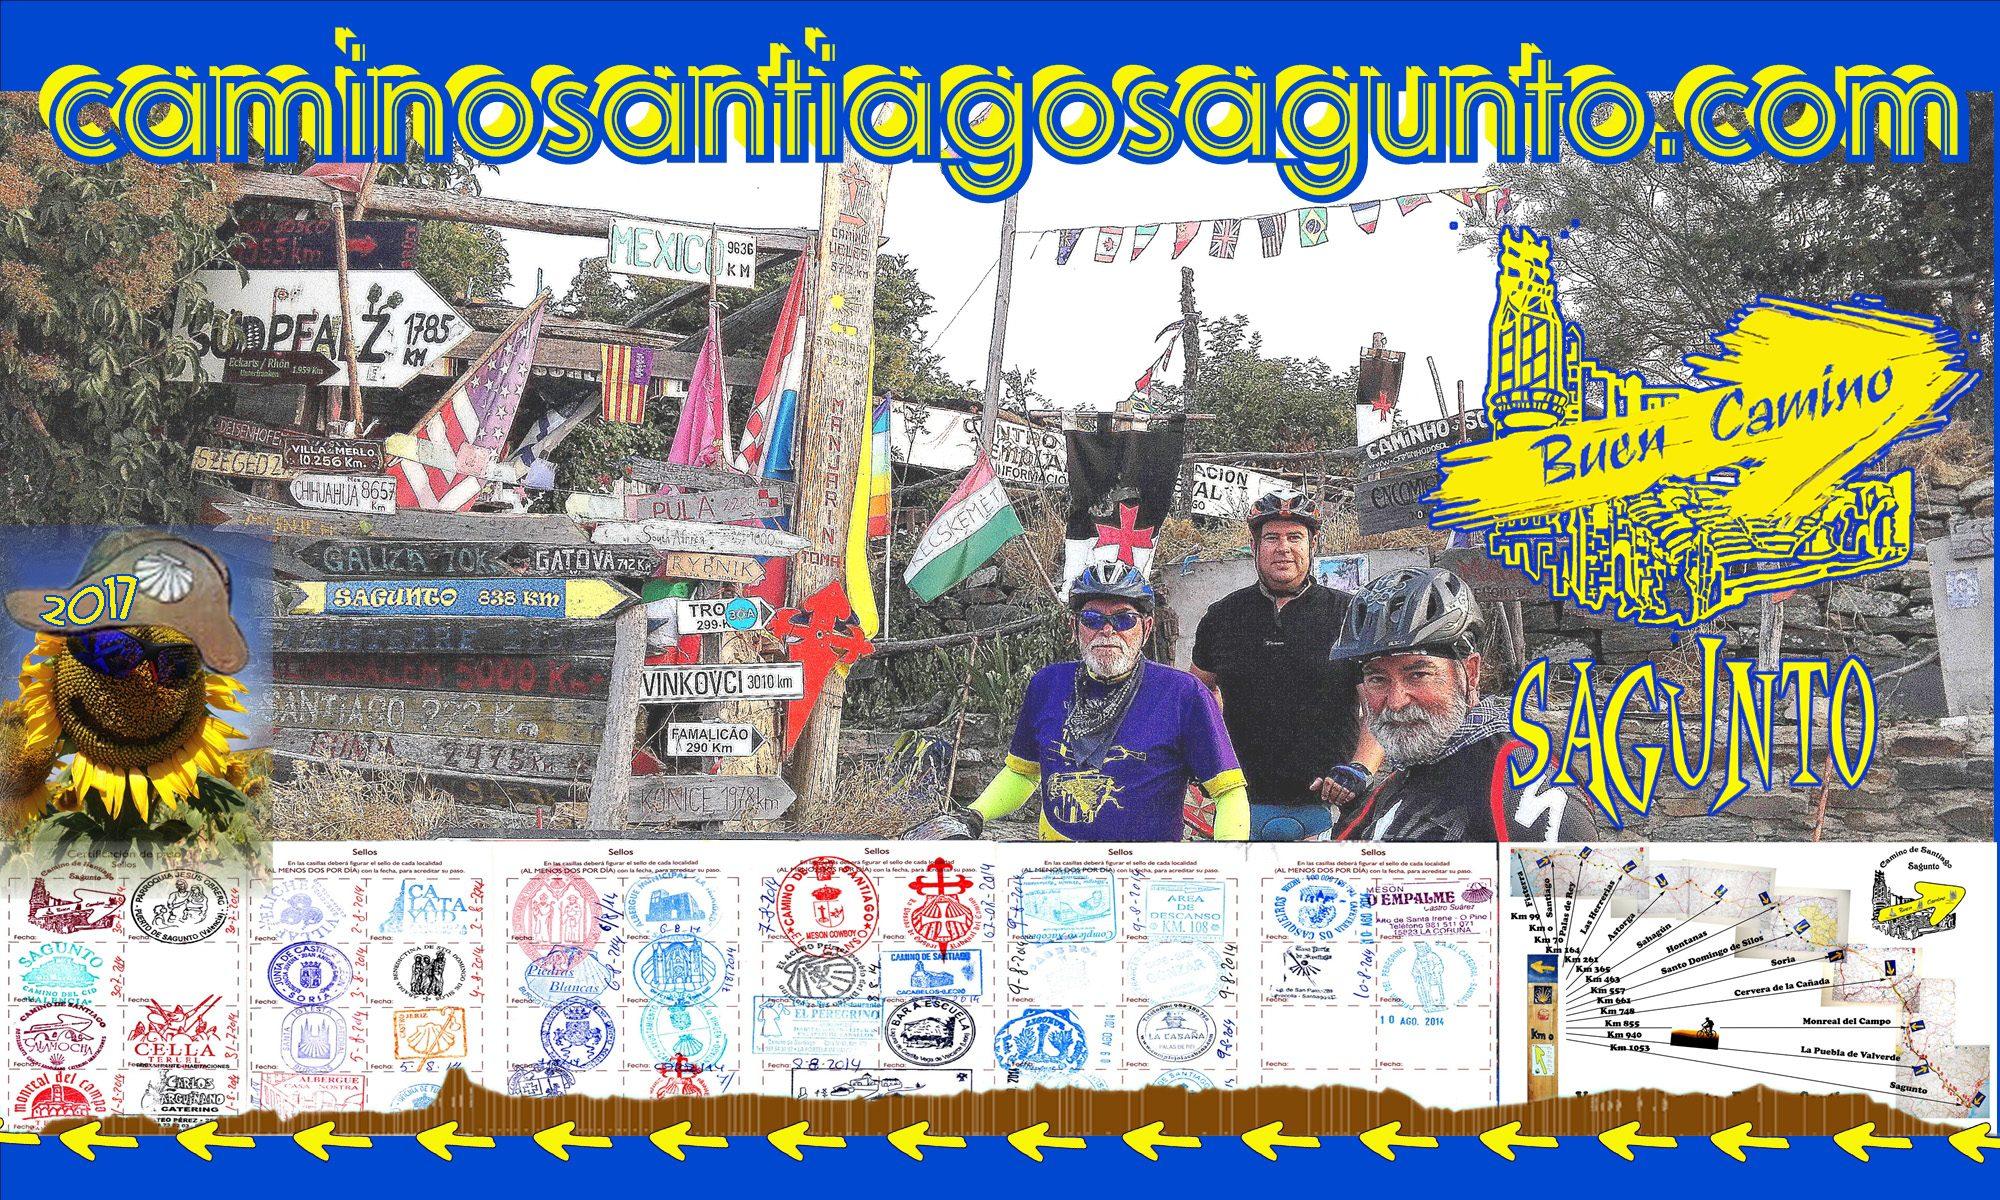 Camino Santiago de Sagunto en Bicicleta